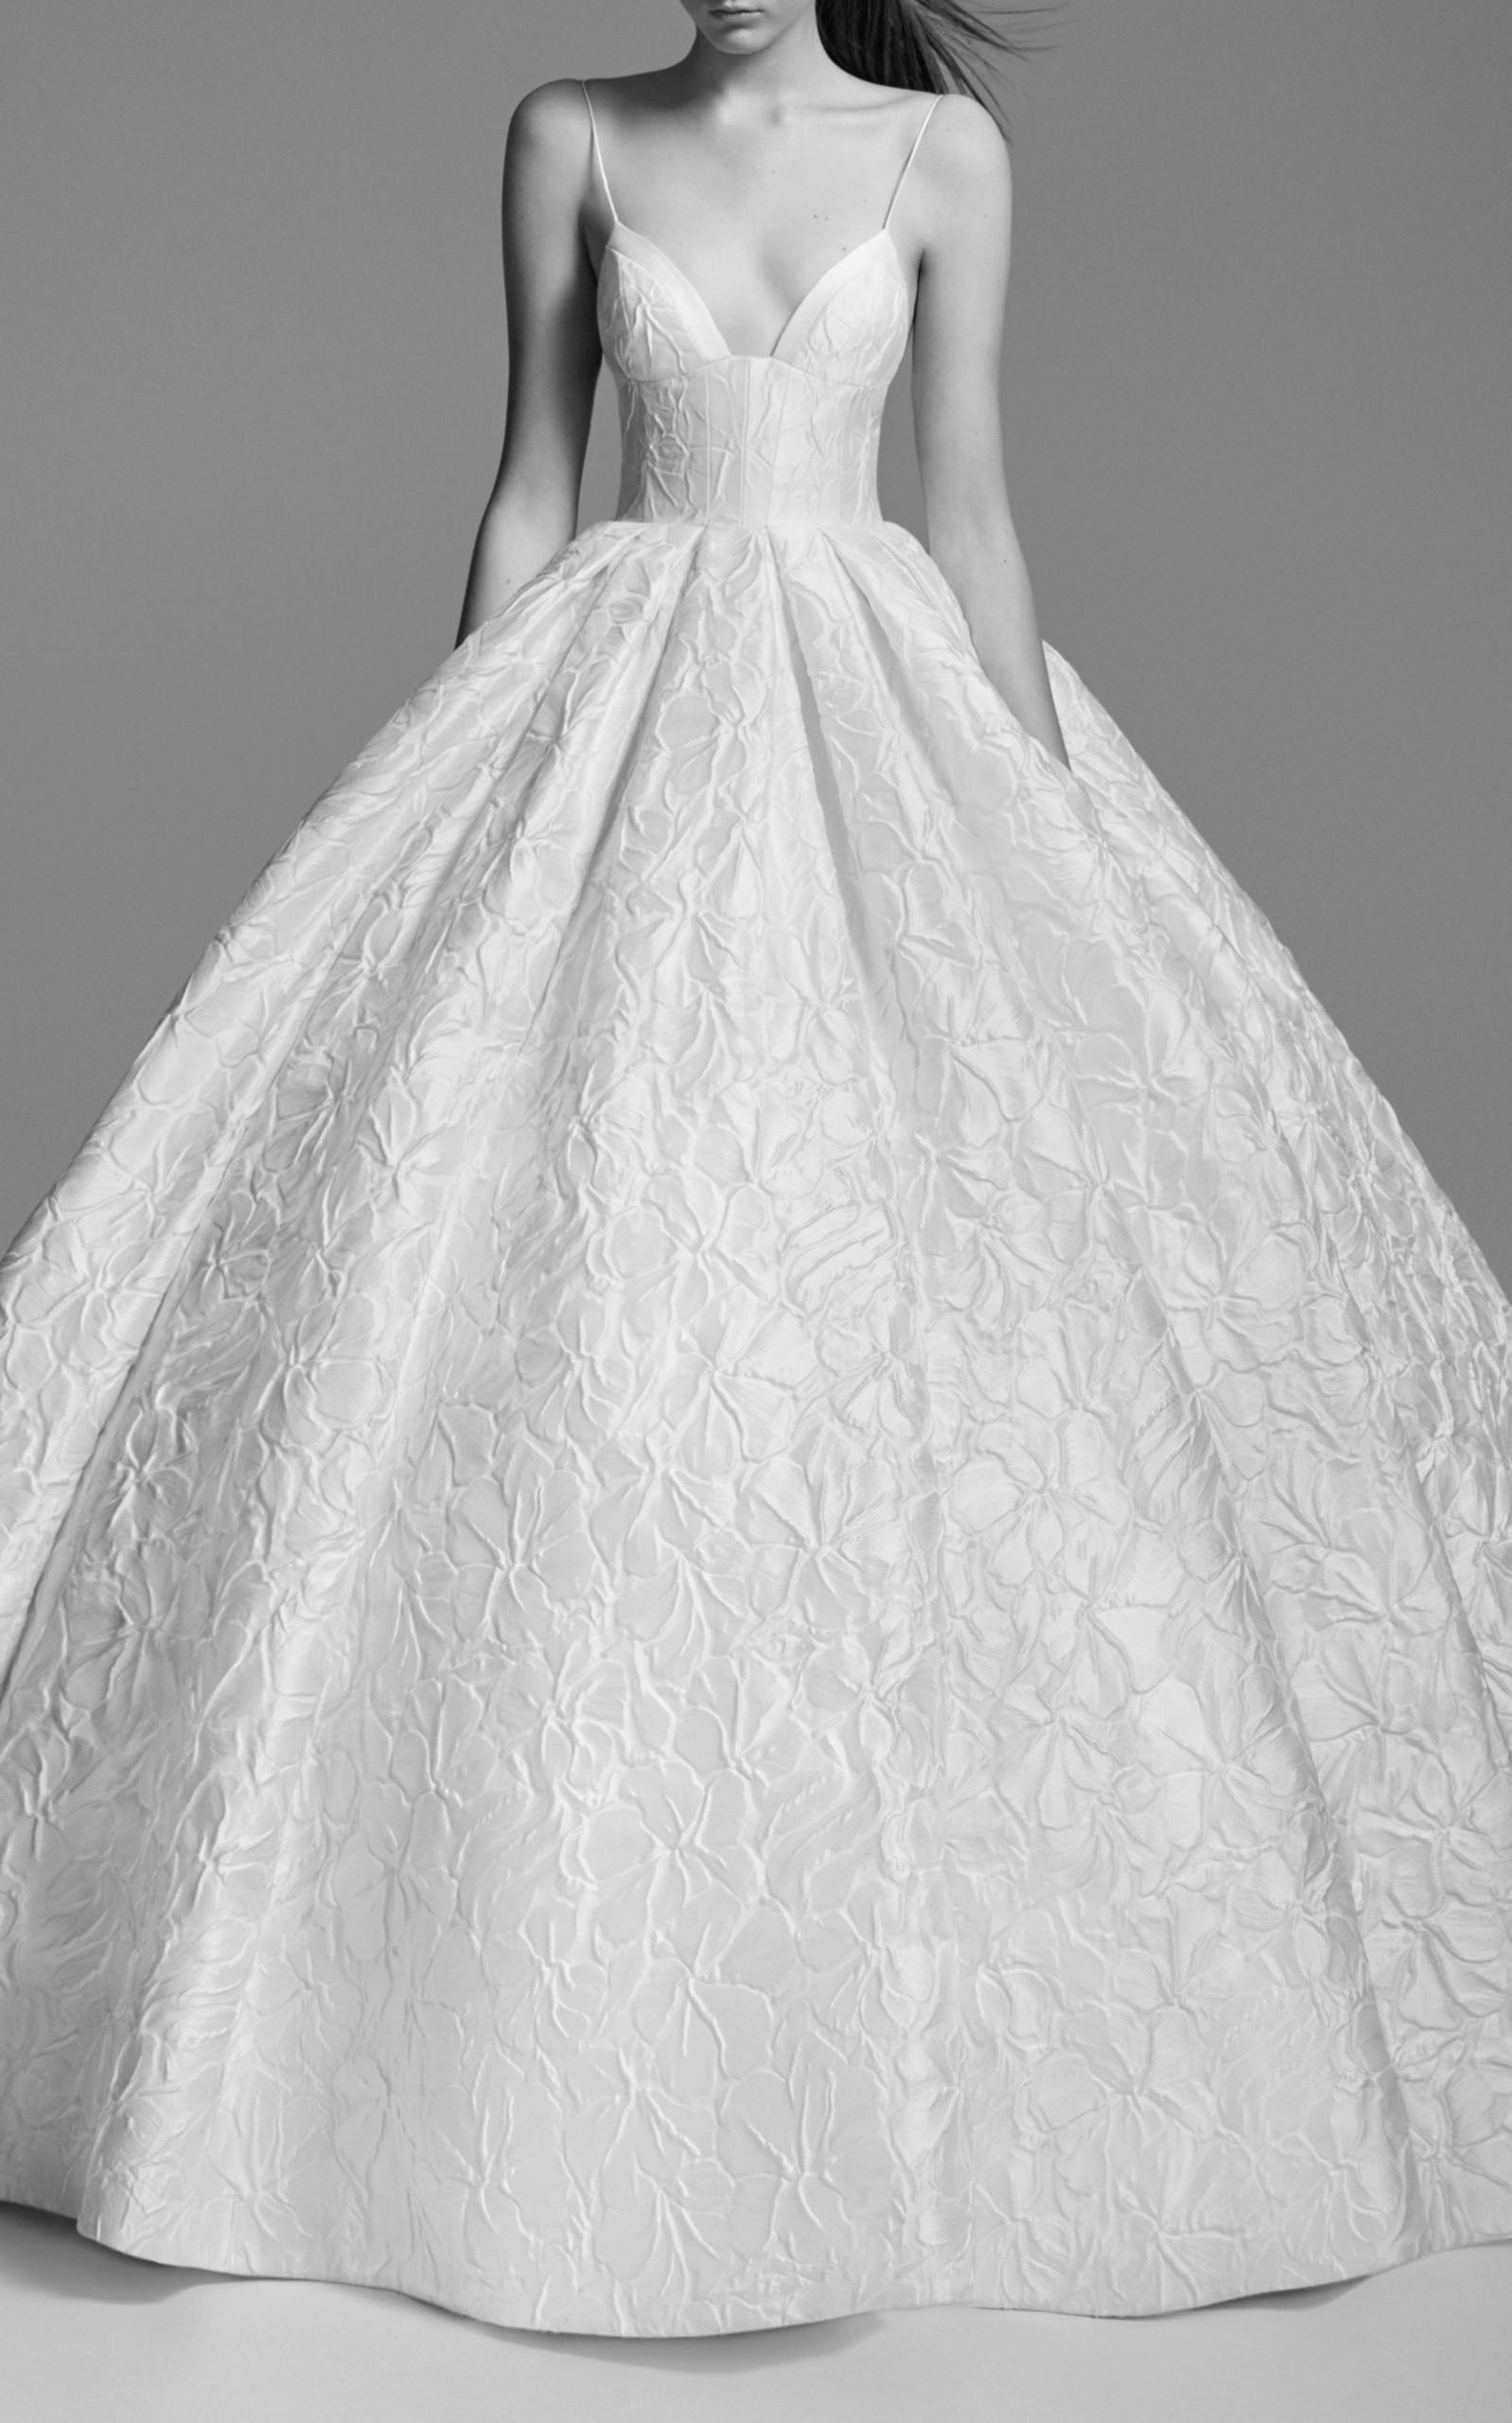 Modern Luxury Wedding Dresses | Alex Perry Bride - BridalPulse